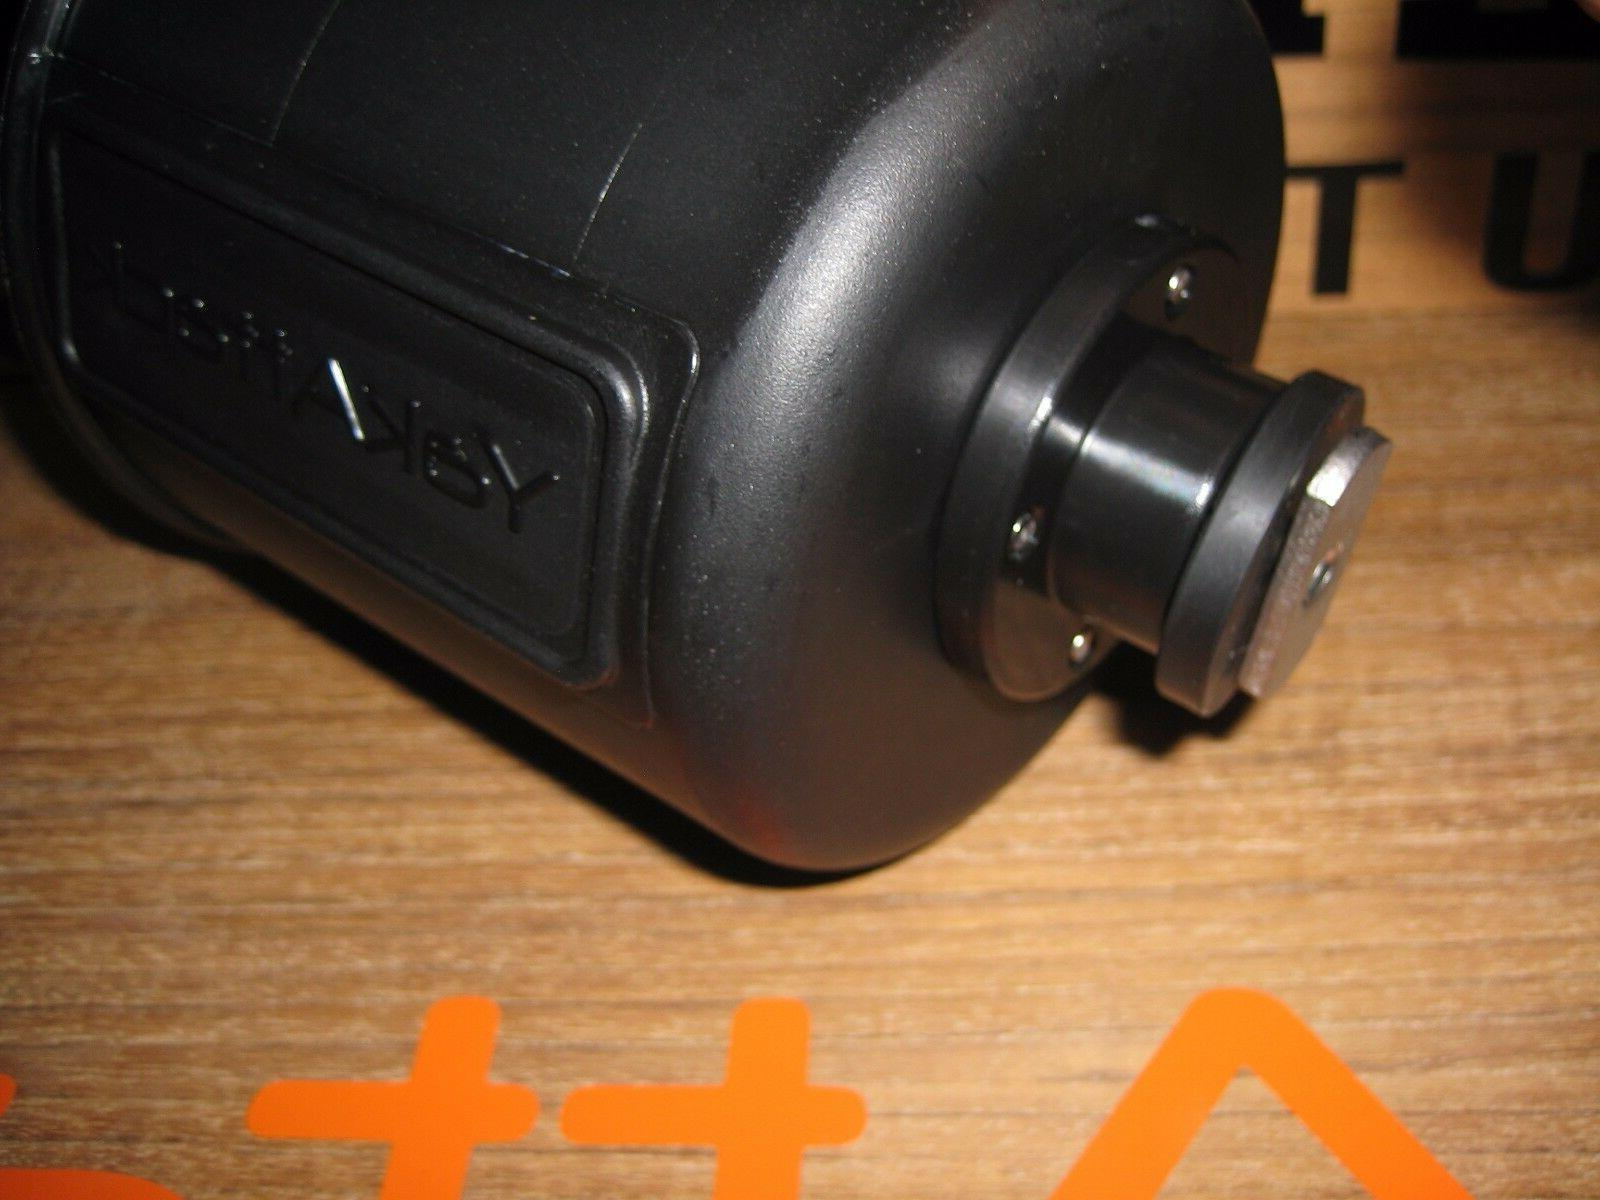 New Yakattack Multimount Cup Holder SSO-1001 usa